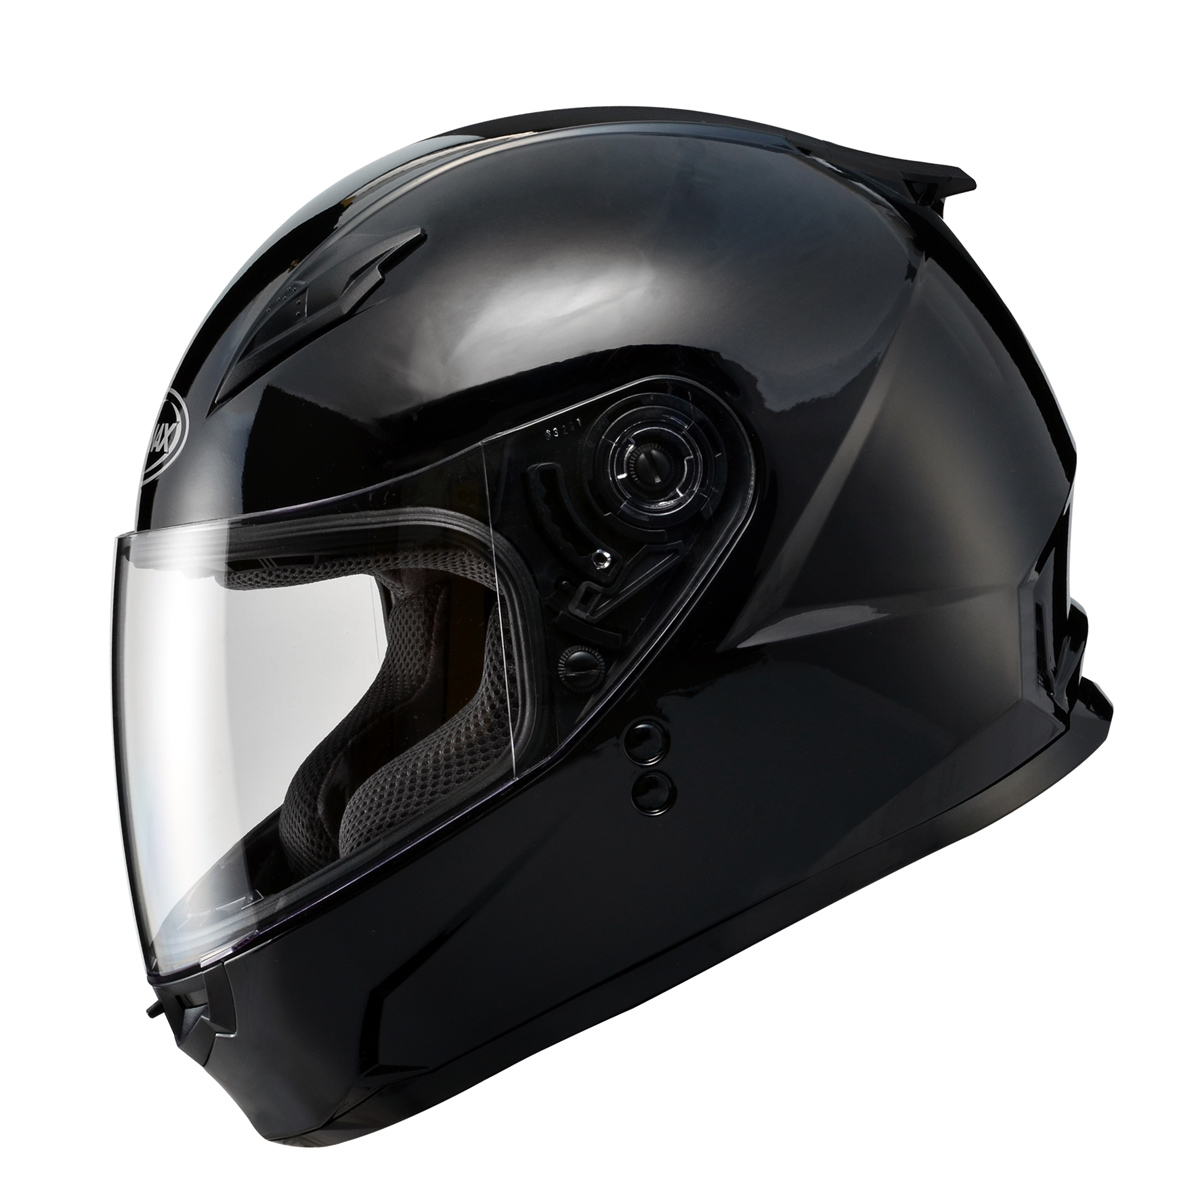 GMAX GM49Y Youth Gloss Black Full Face Helmet